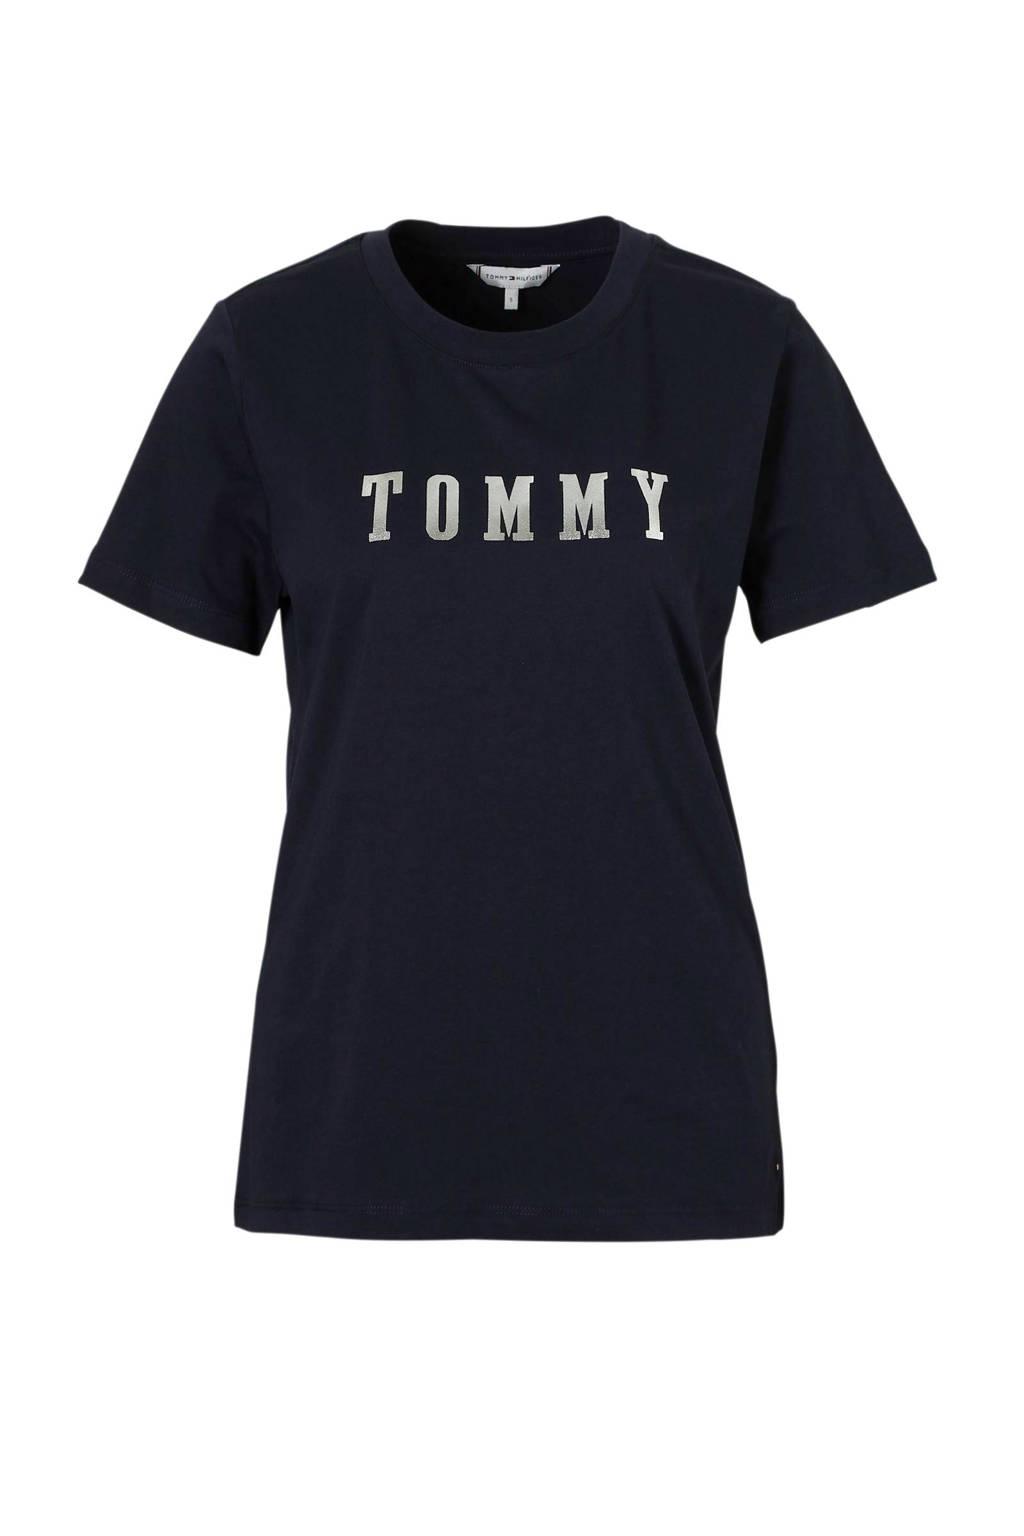 Tommy Hilfiger T-shirt Holli met logo opdruk, Donkerblauw